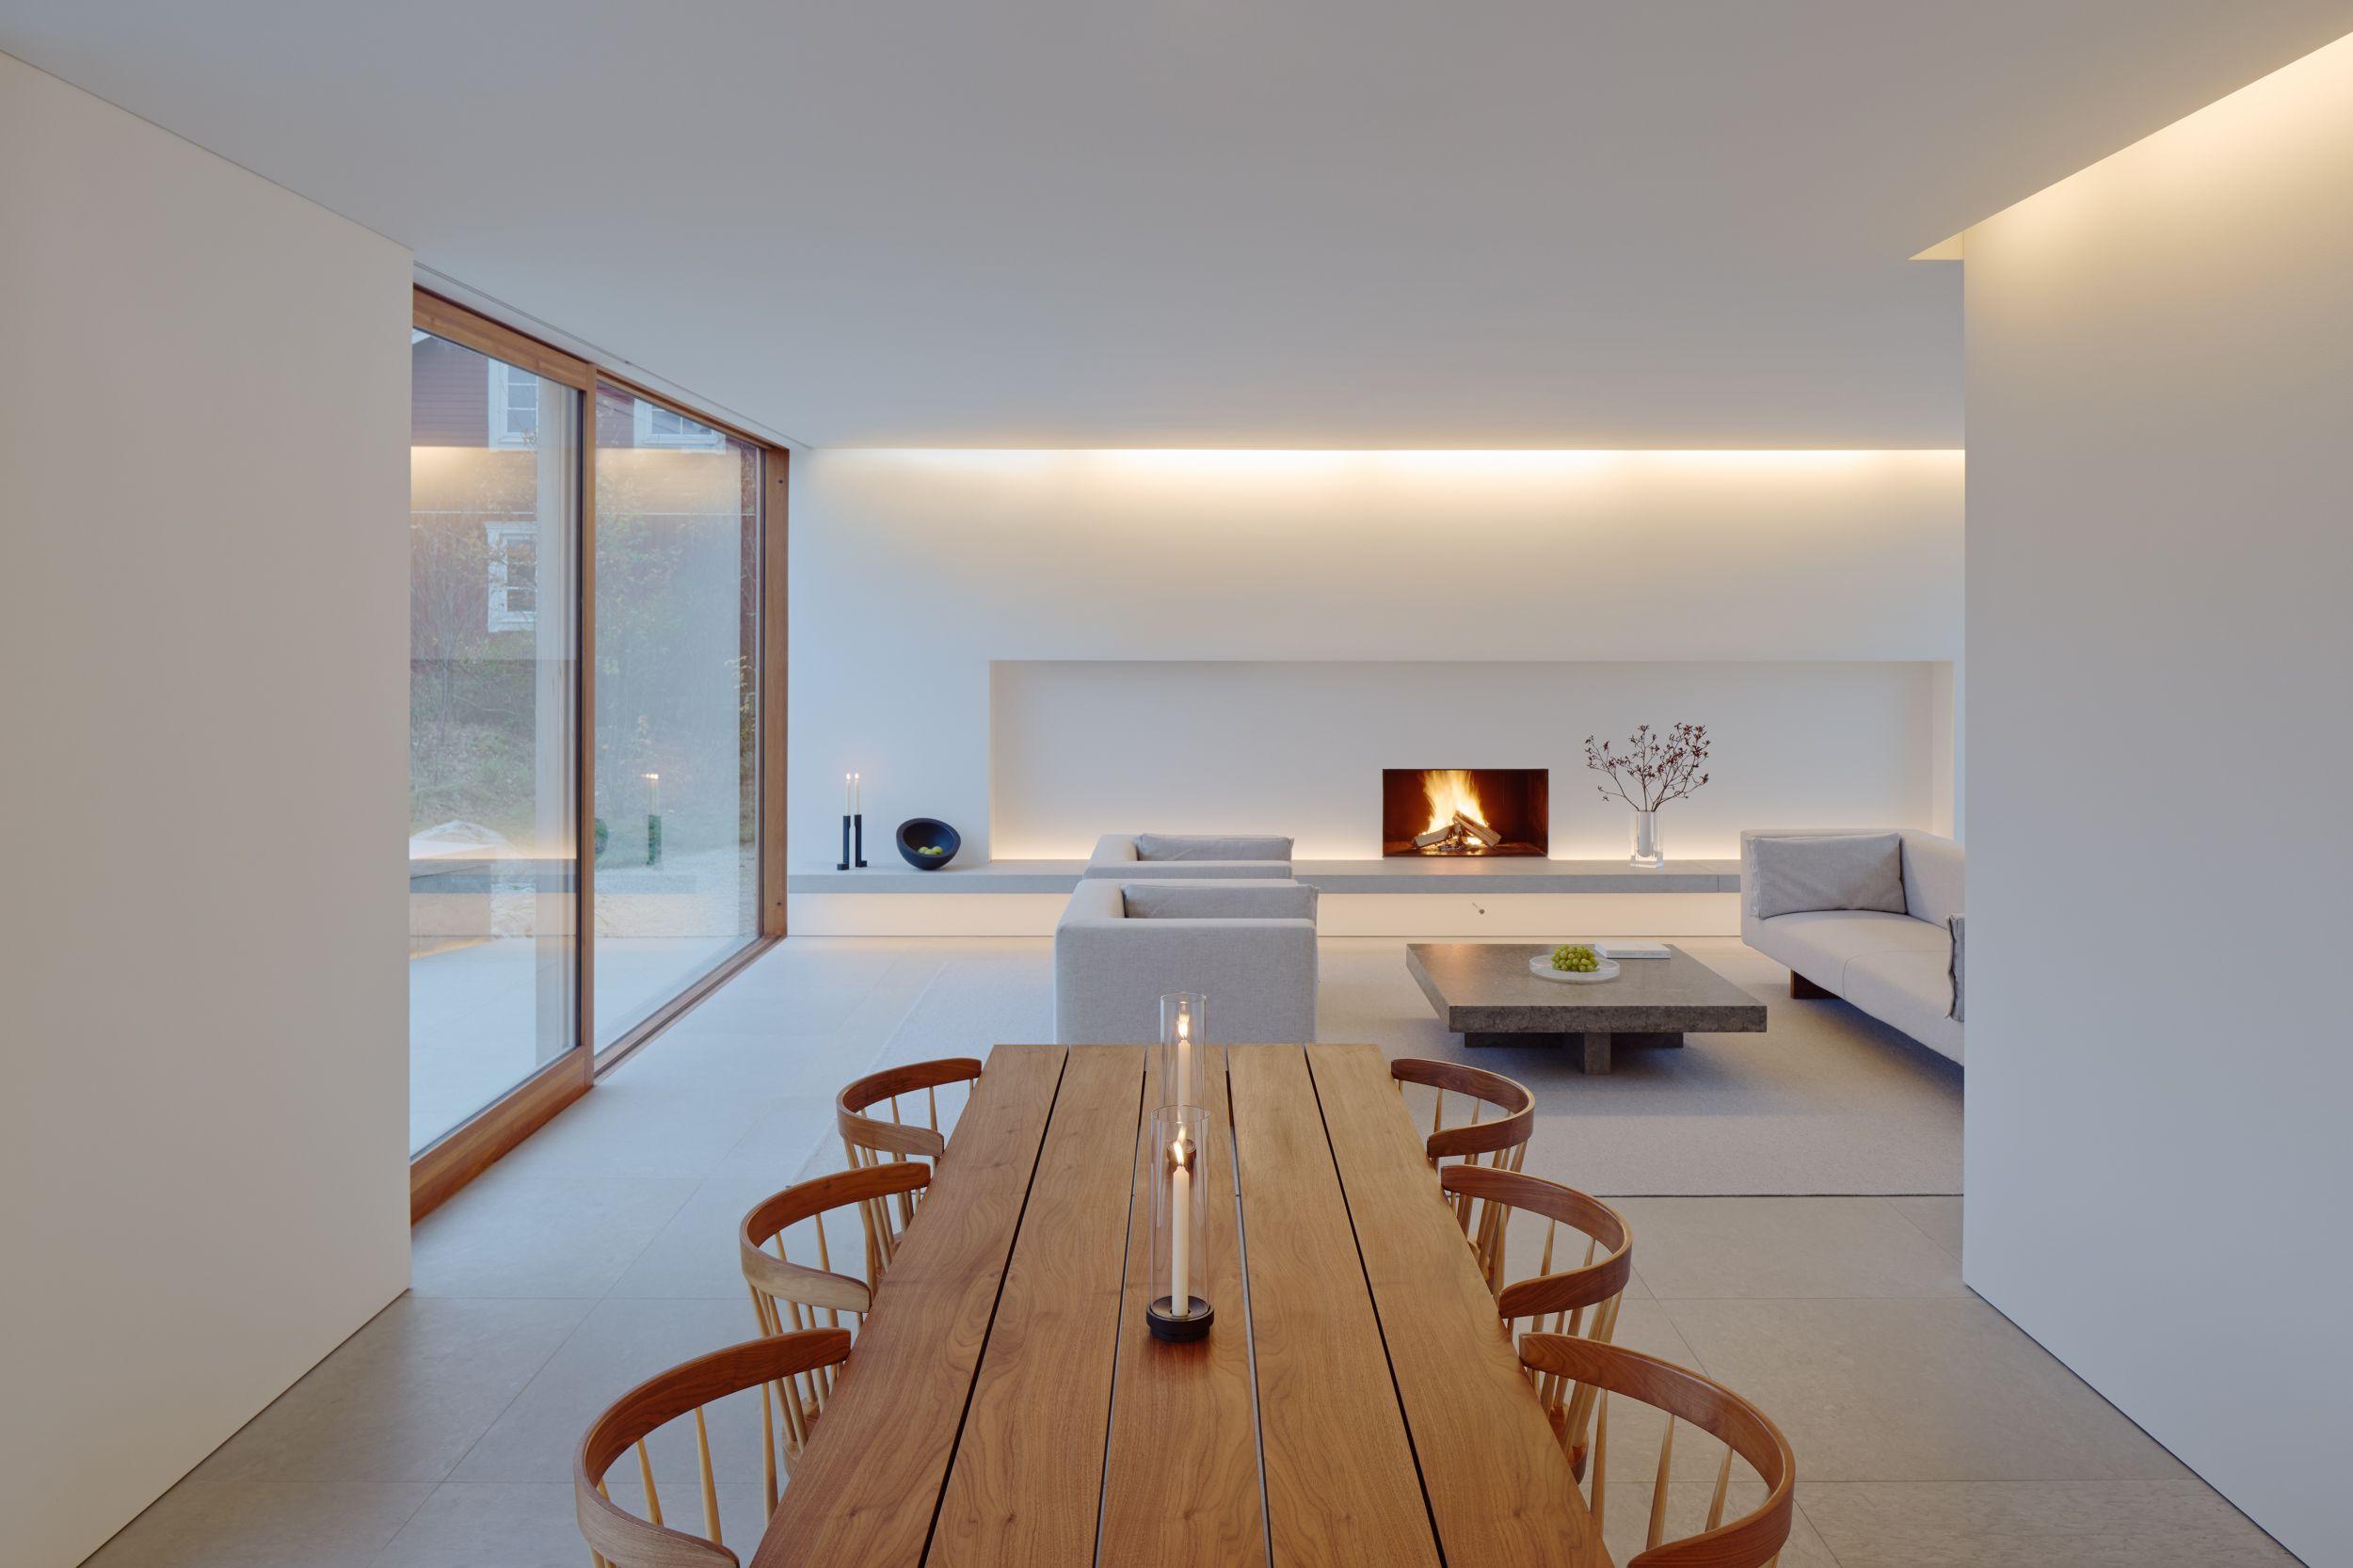 Works palmgren house lighting for Minimal space